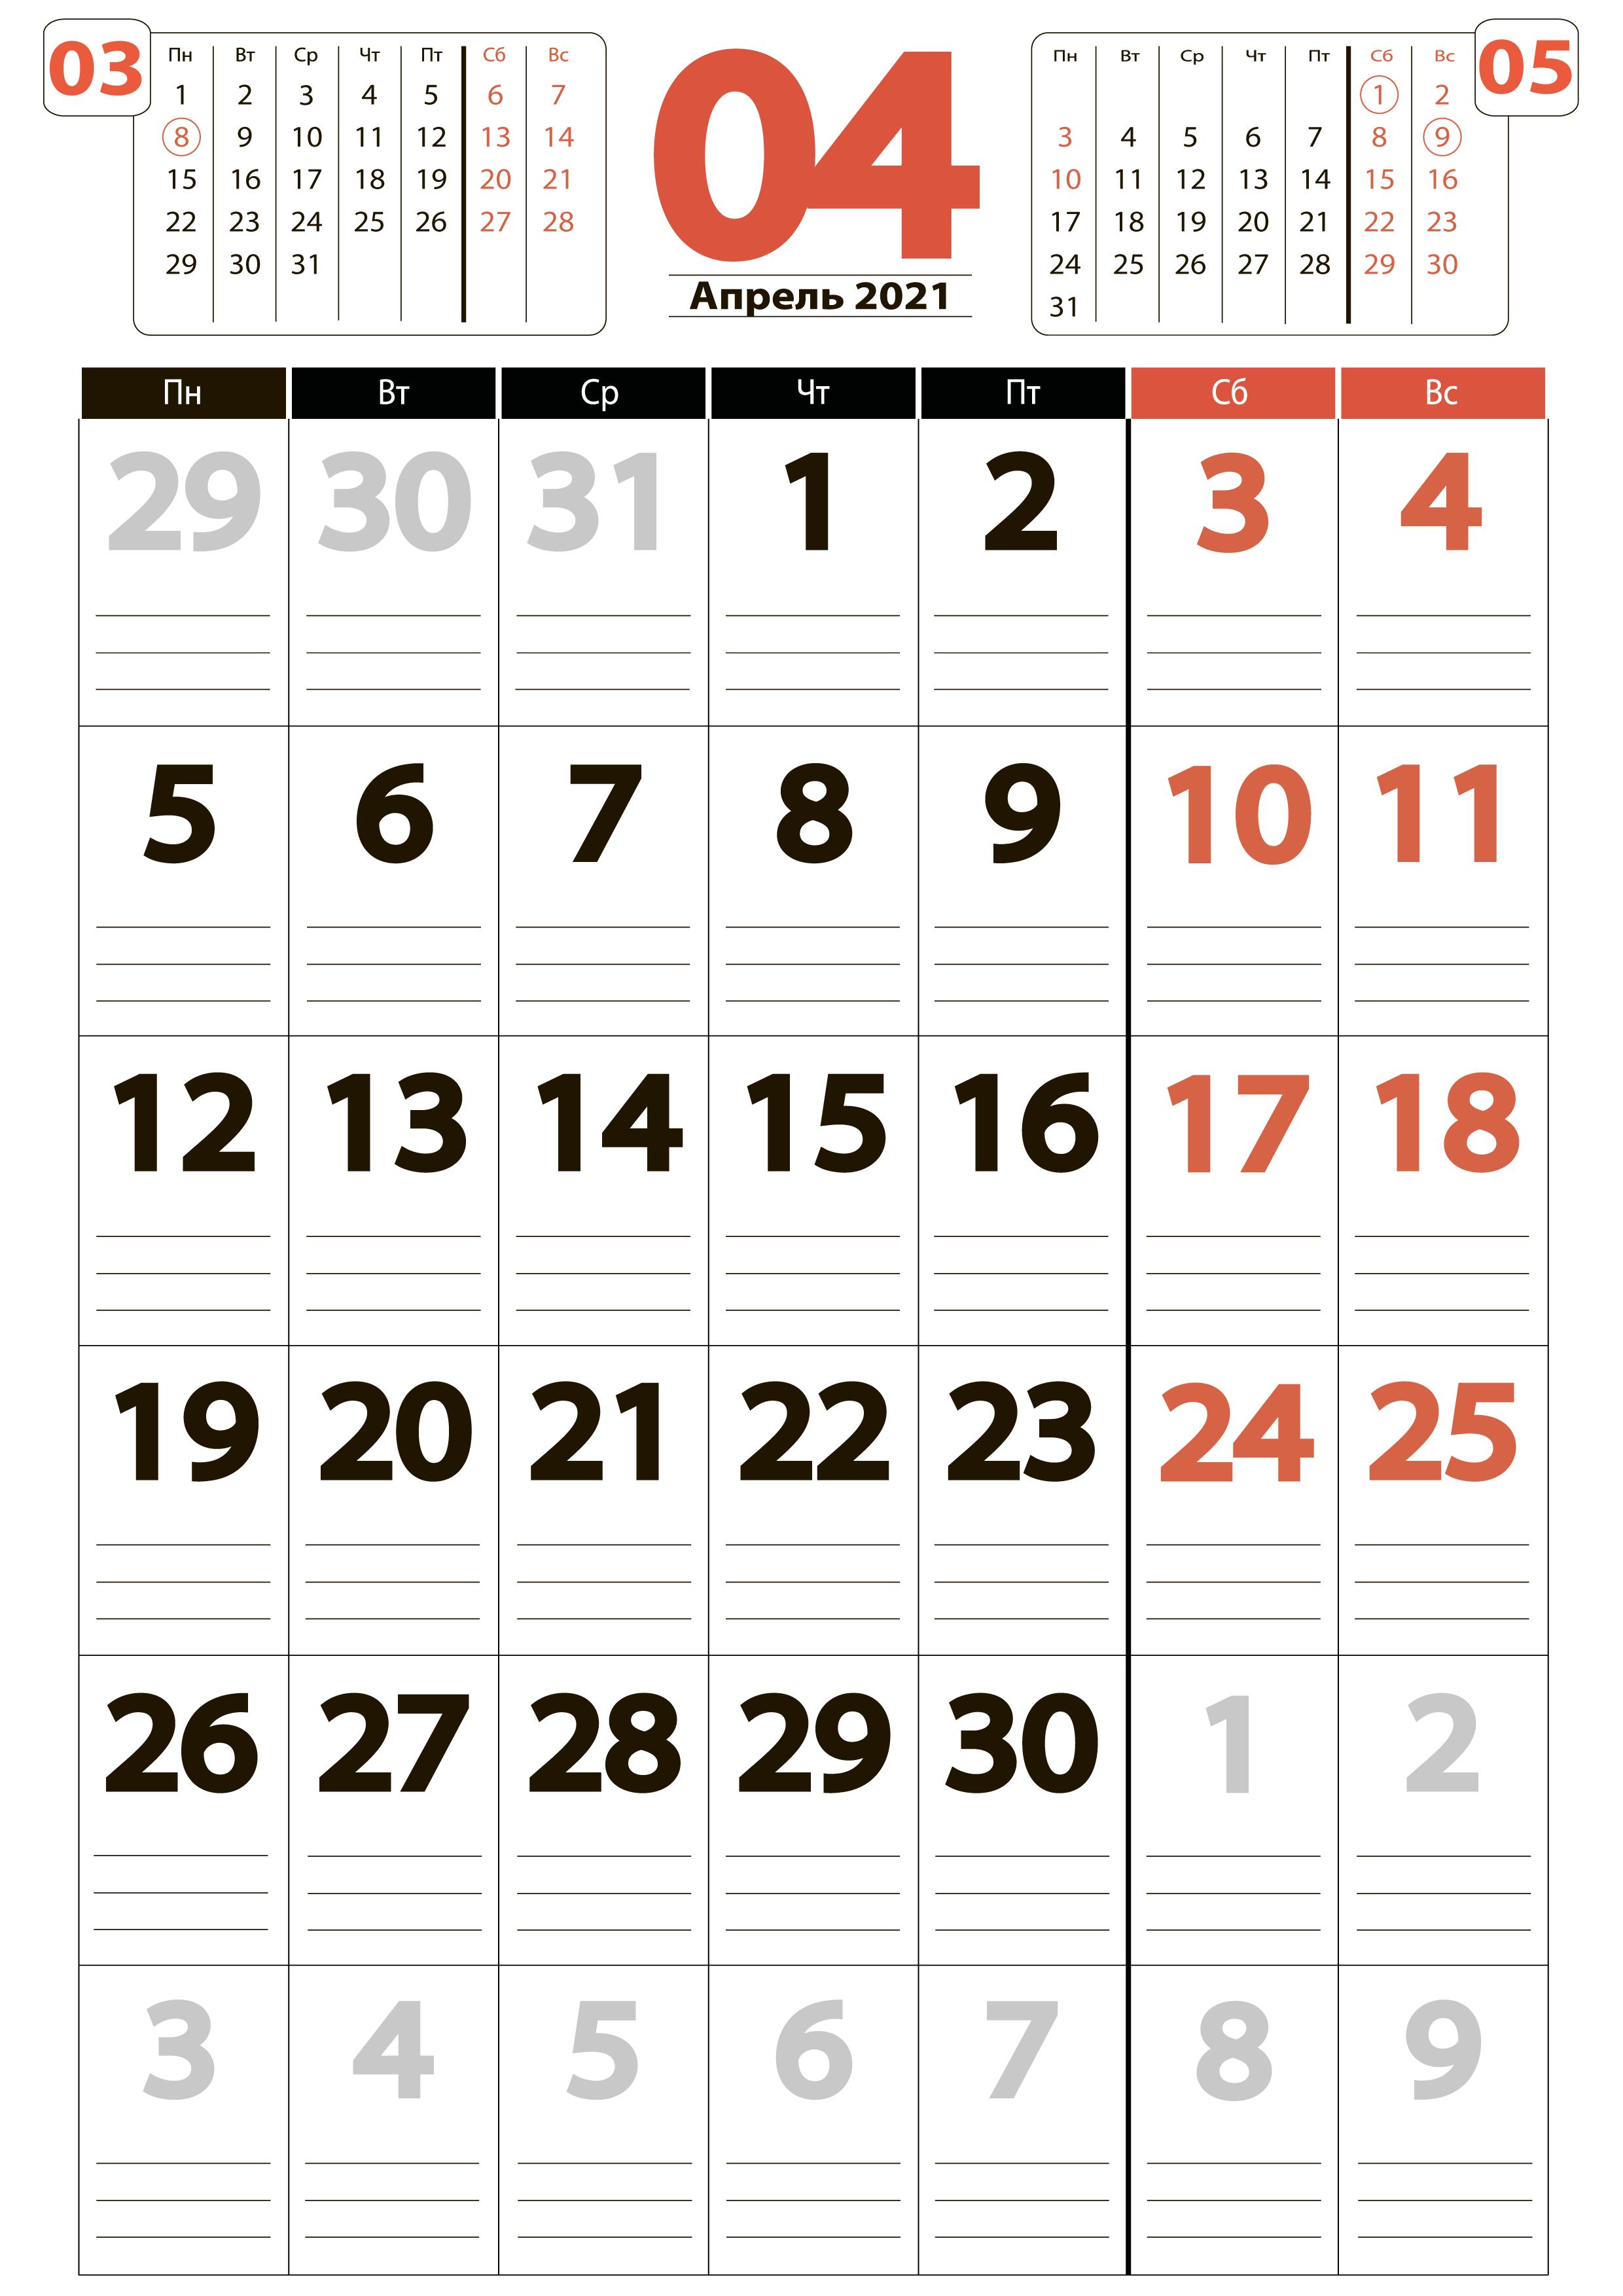 Апрель 2021 - Календарь книжный формат